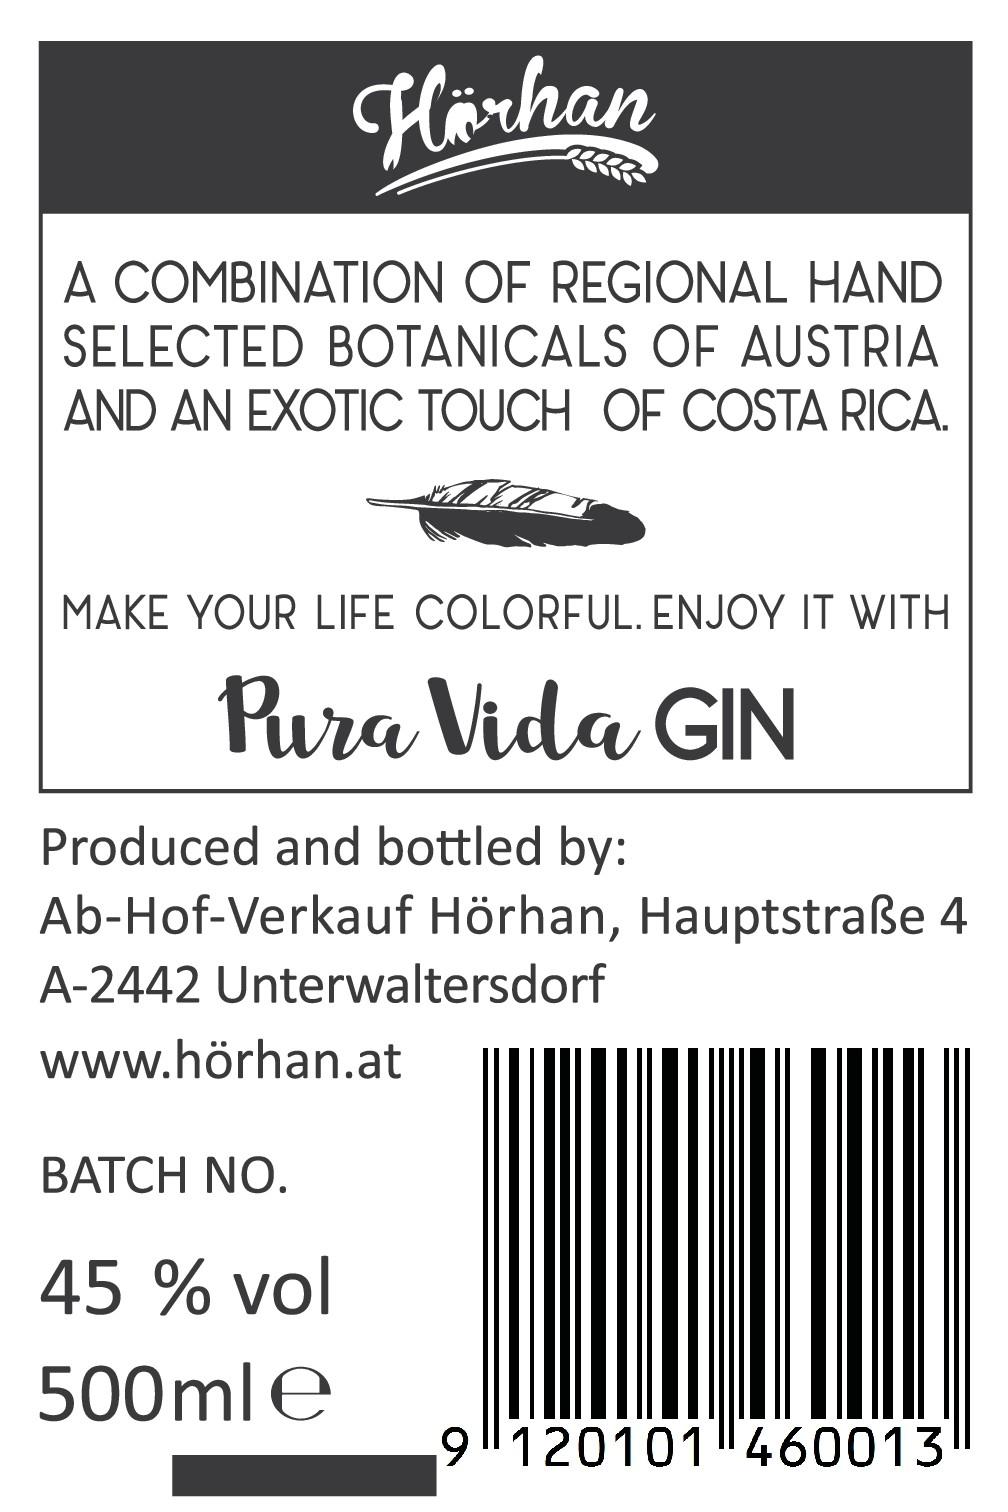 Create a bottle label for Pura Vida Gin